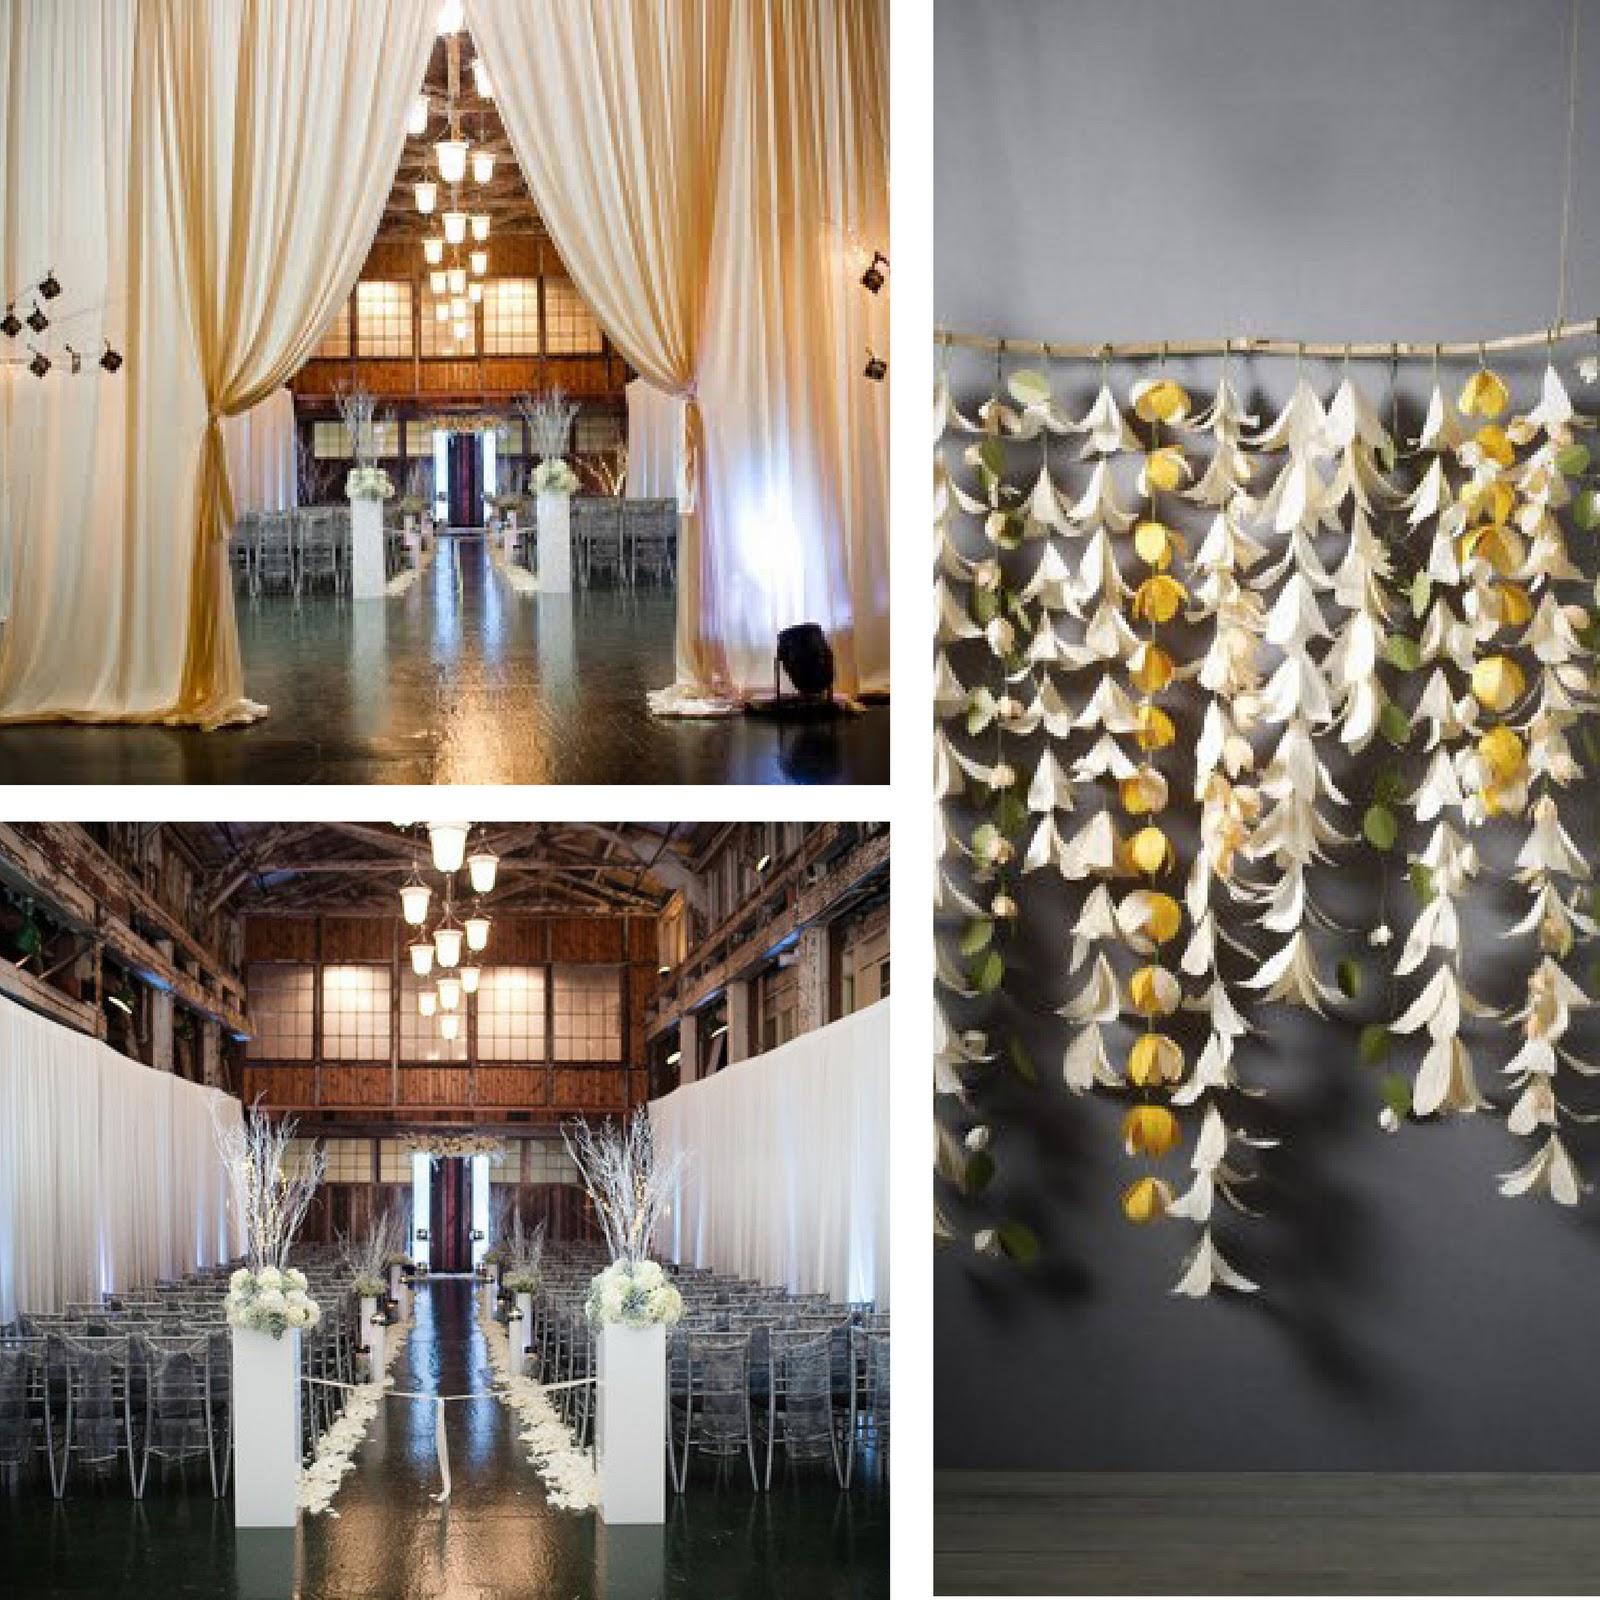 Garden Wedding Ceremony: Sterrling's Blog: Outdoor Wedding Ceremony Ideas